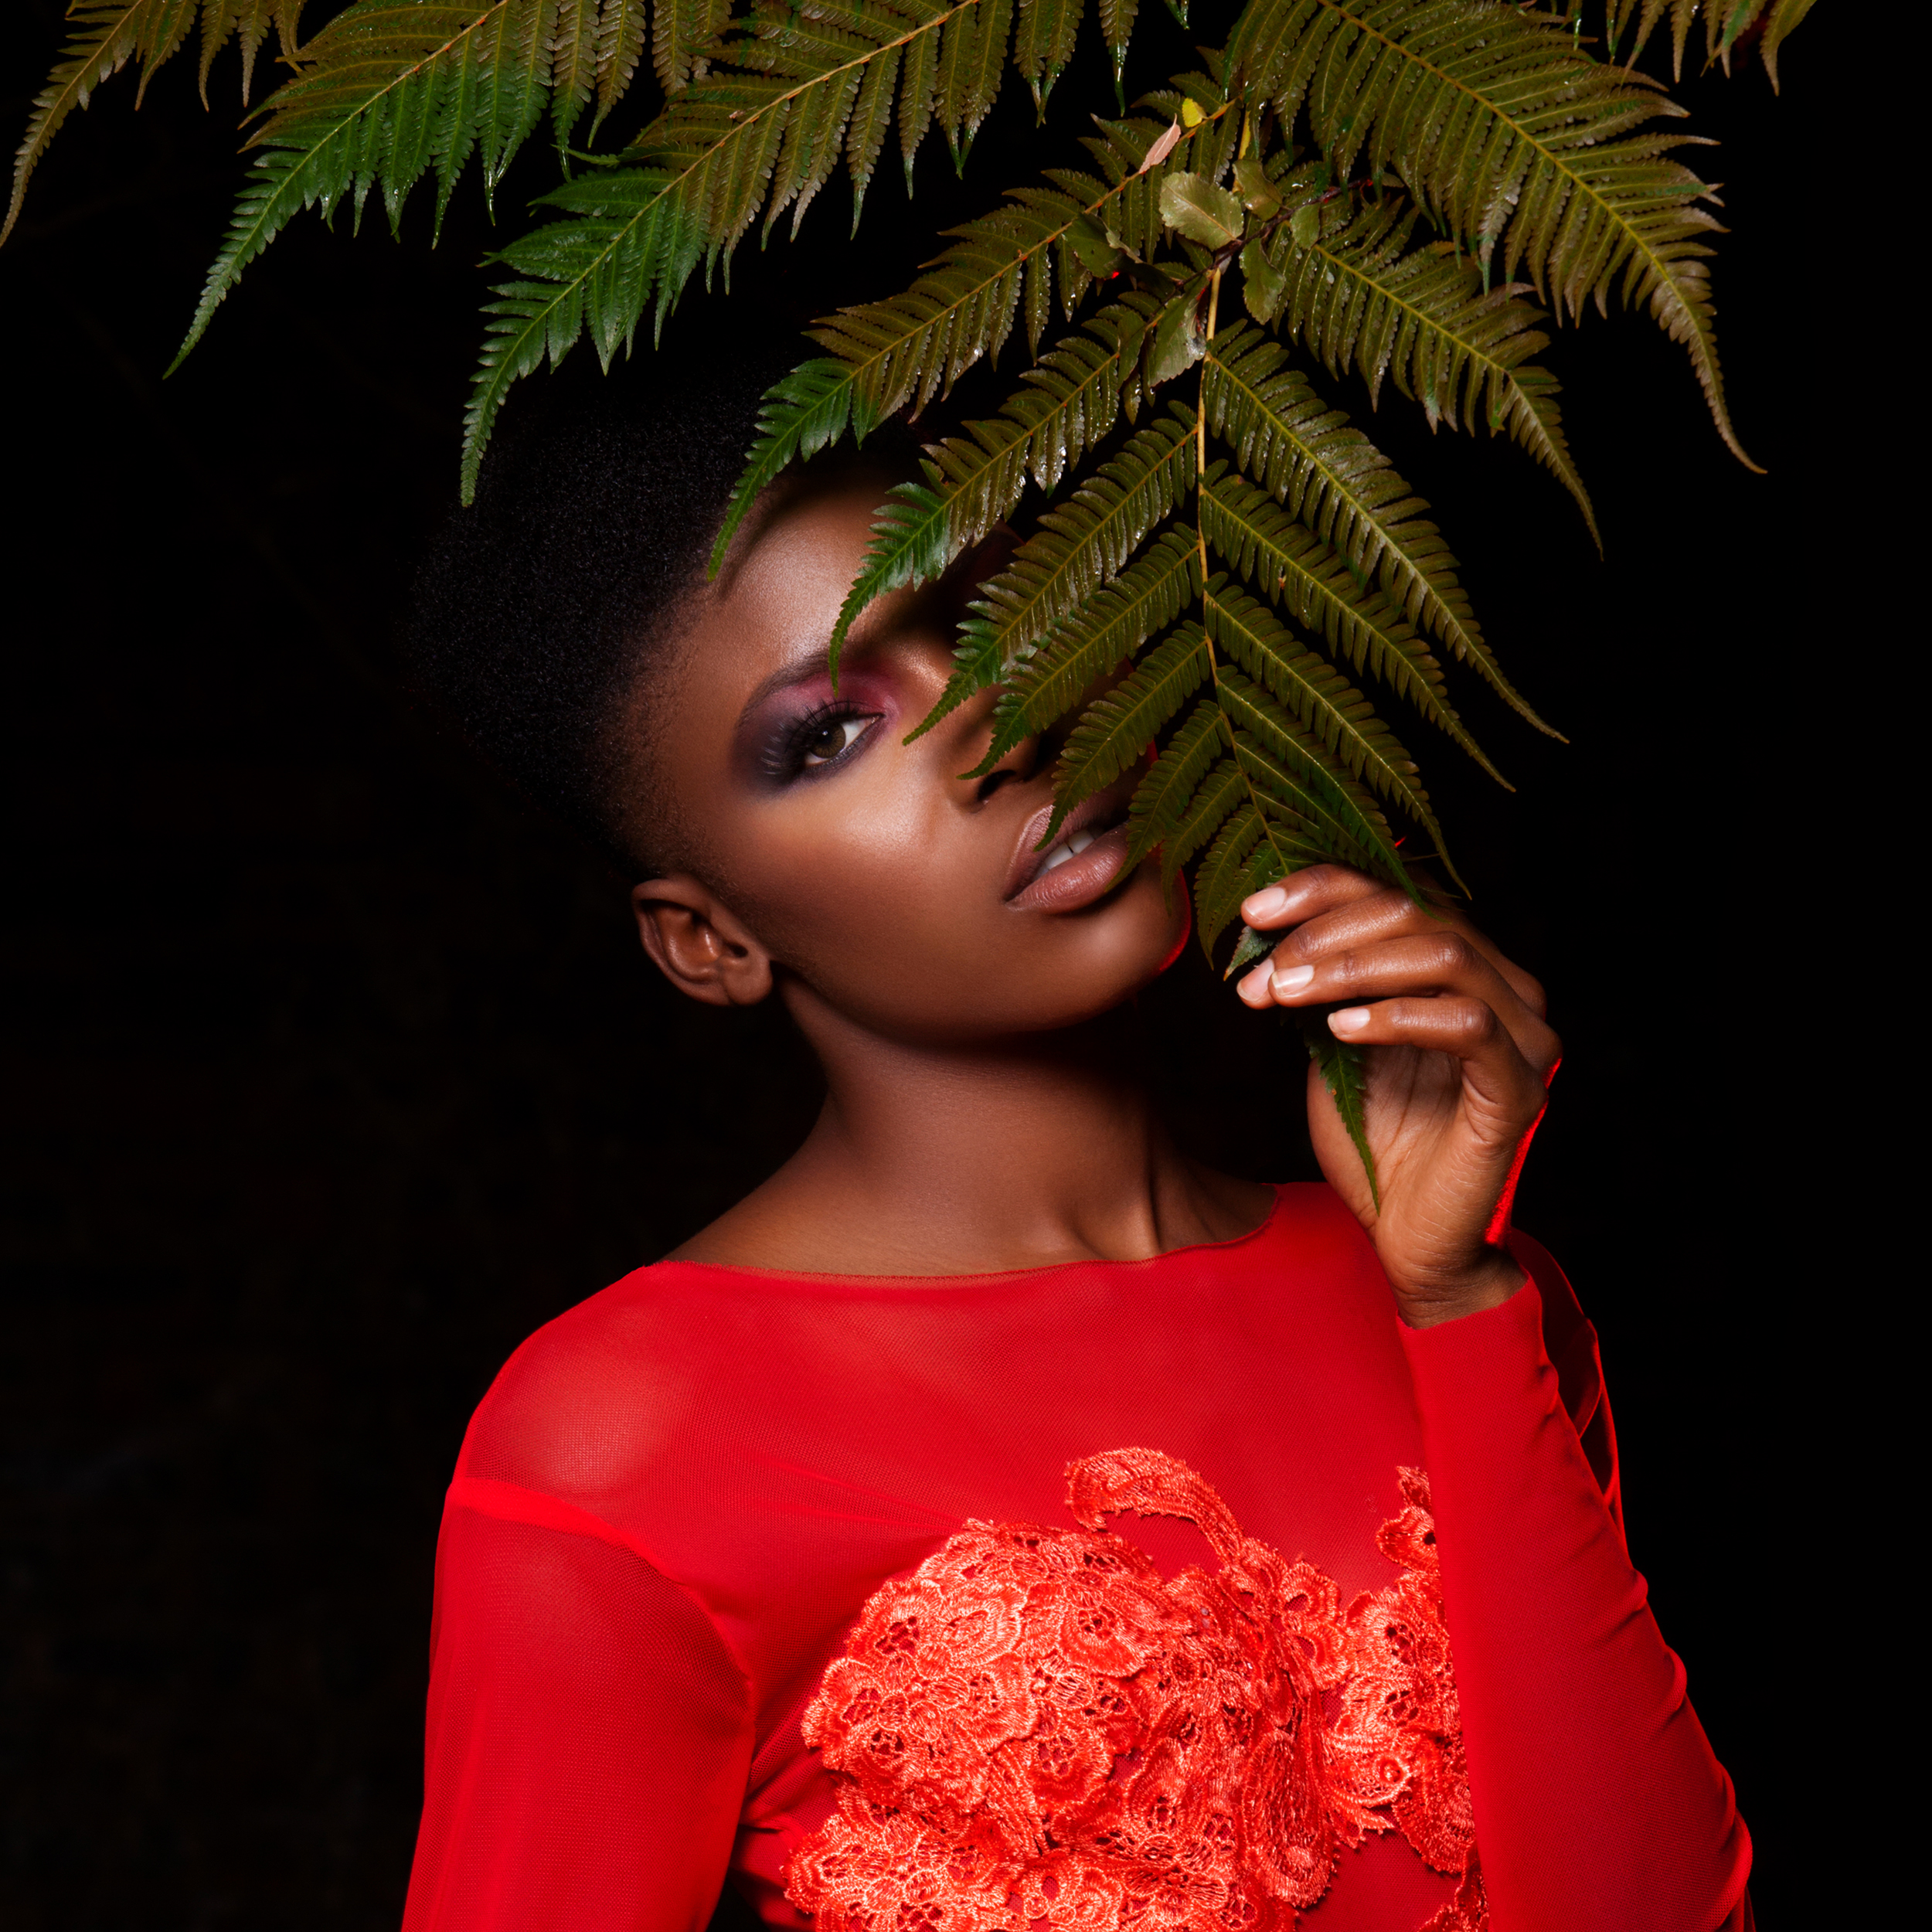 fashion and beauty photography portfolio 1